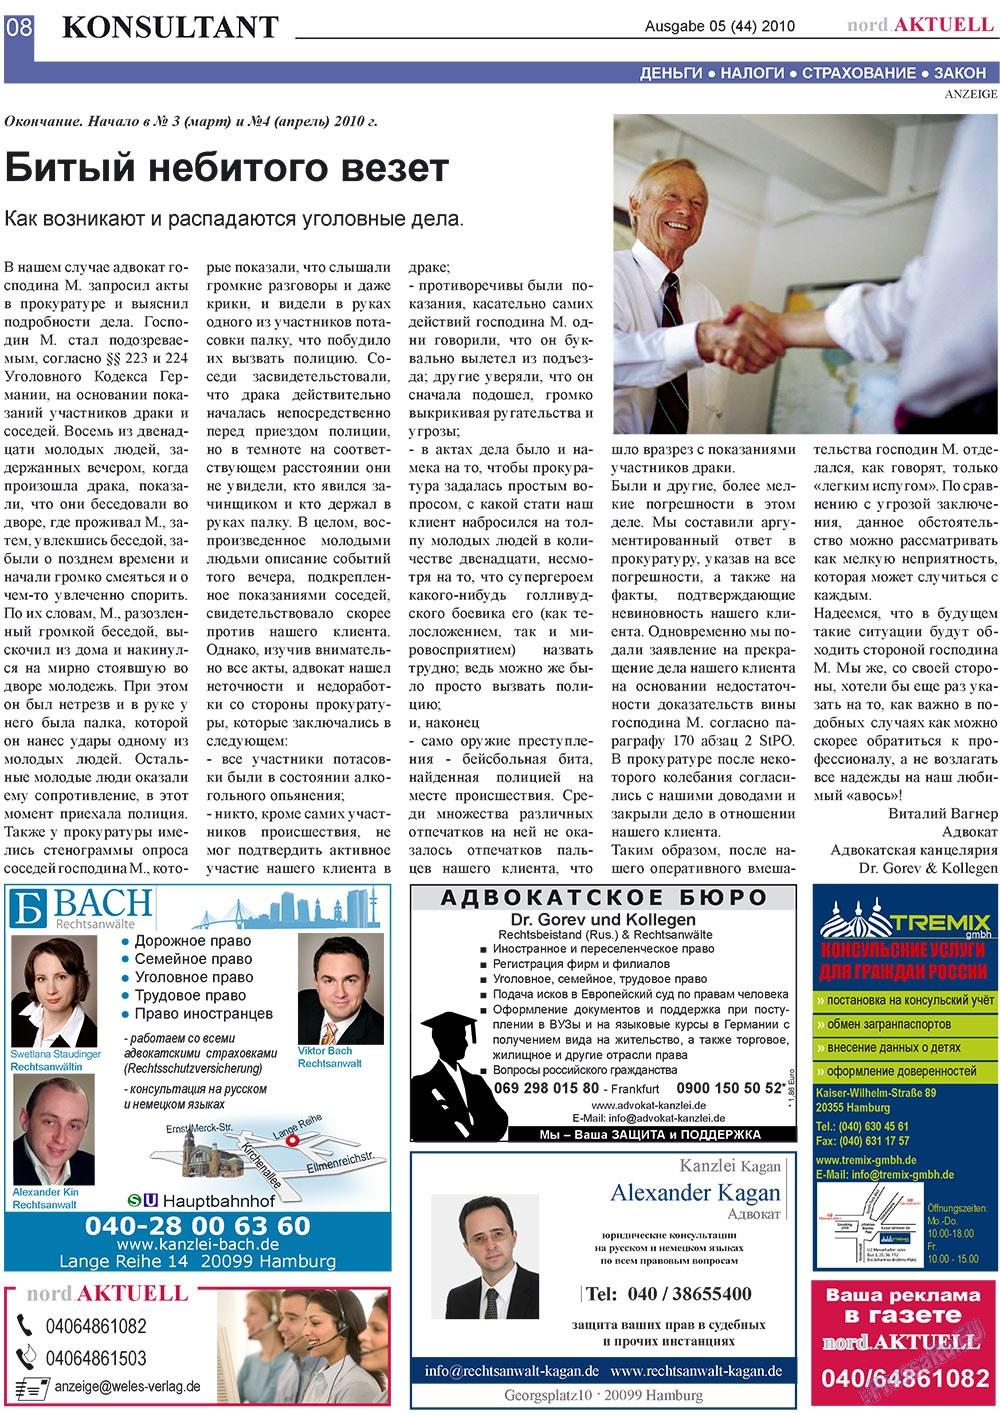 nord.Aktuell (газета). 2010 год, номер 5, стр. 8